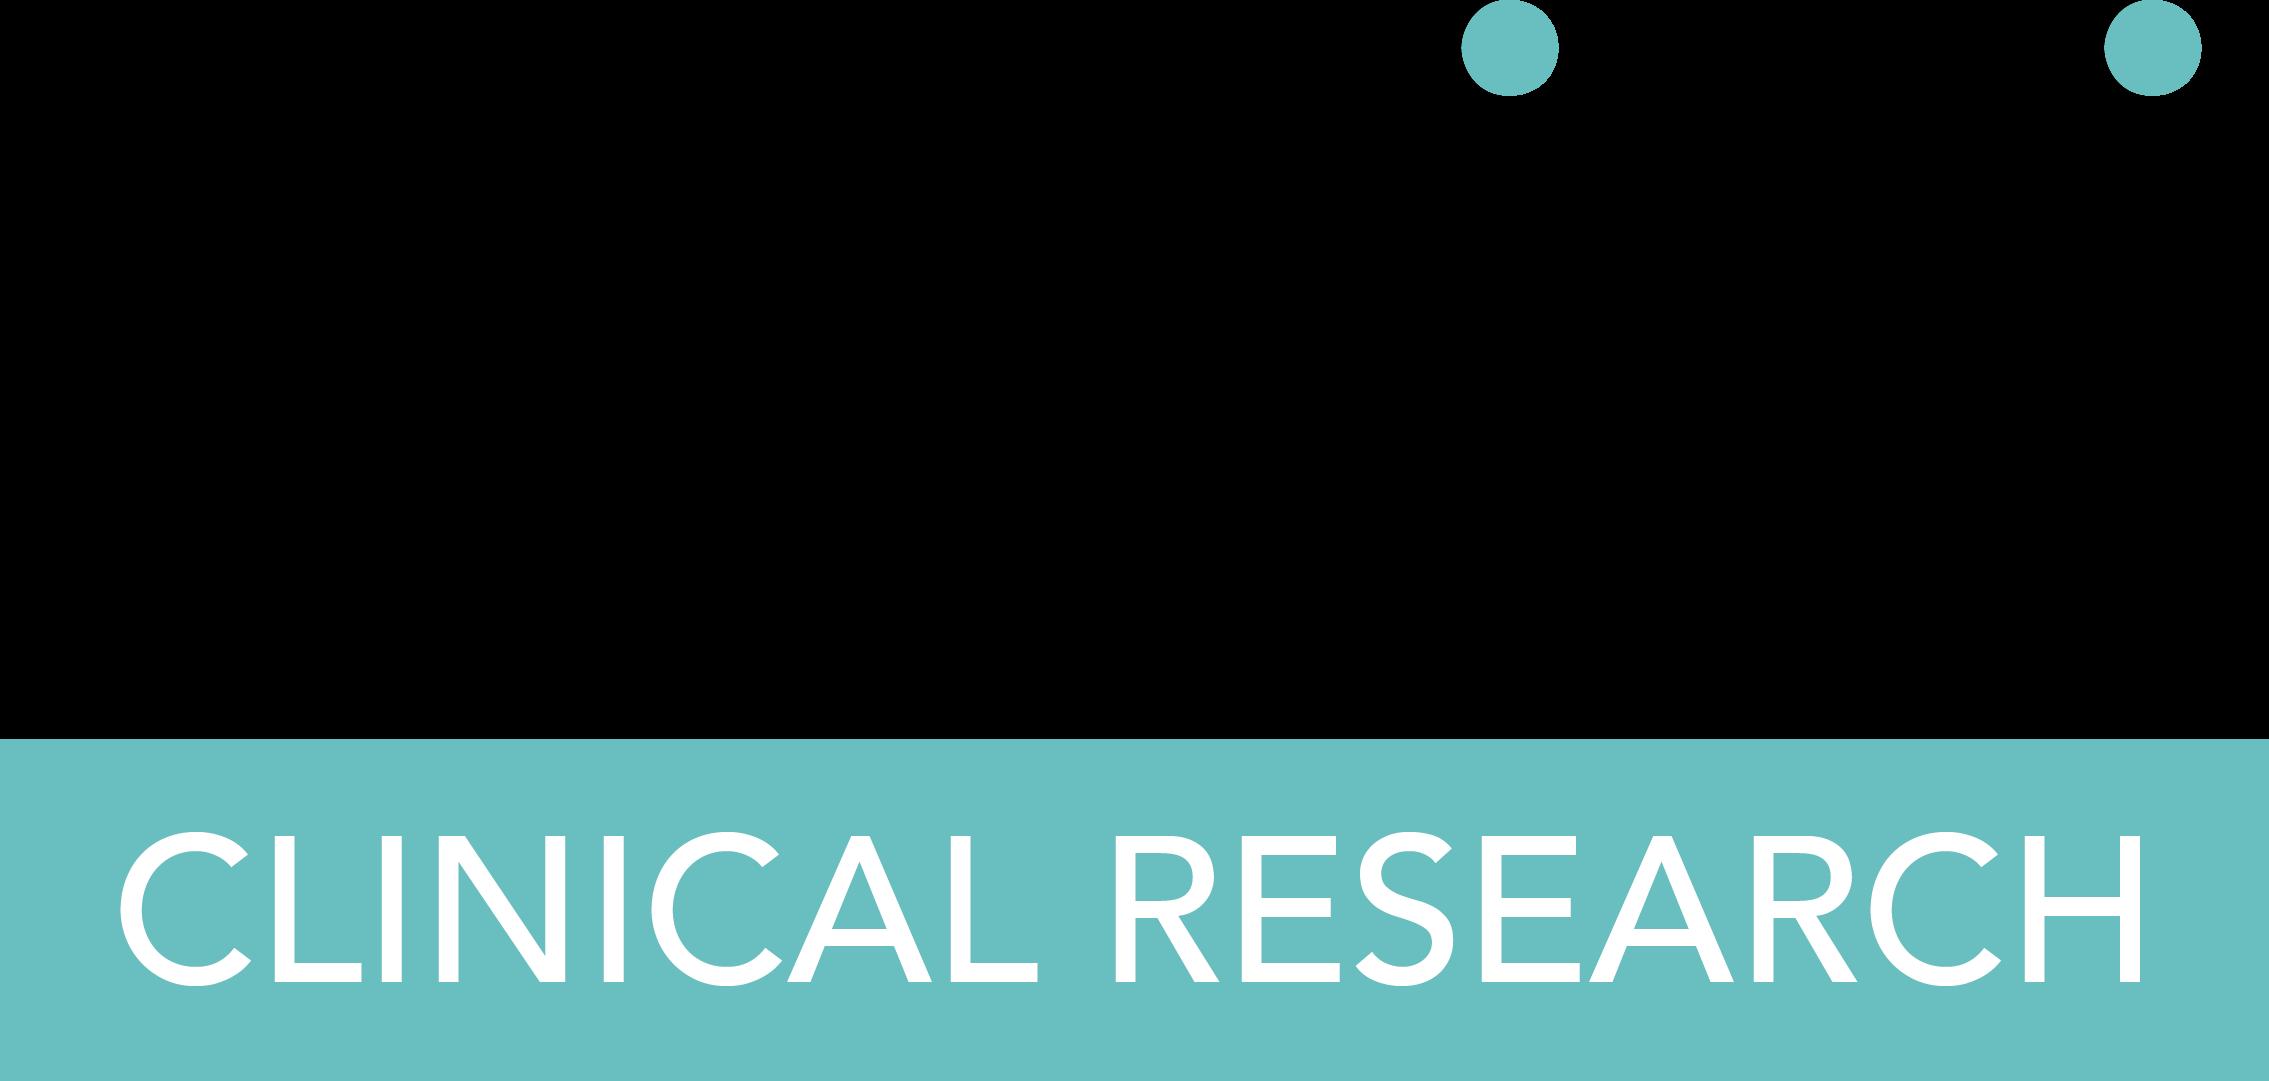 Amici Clinical Research